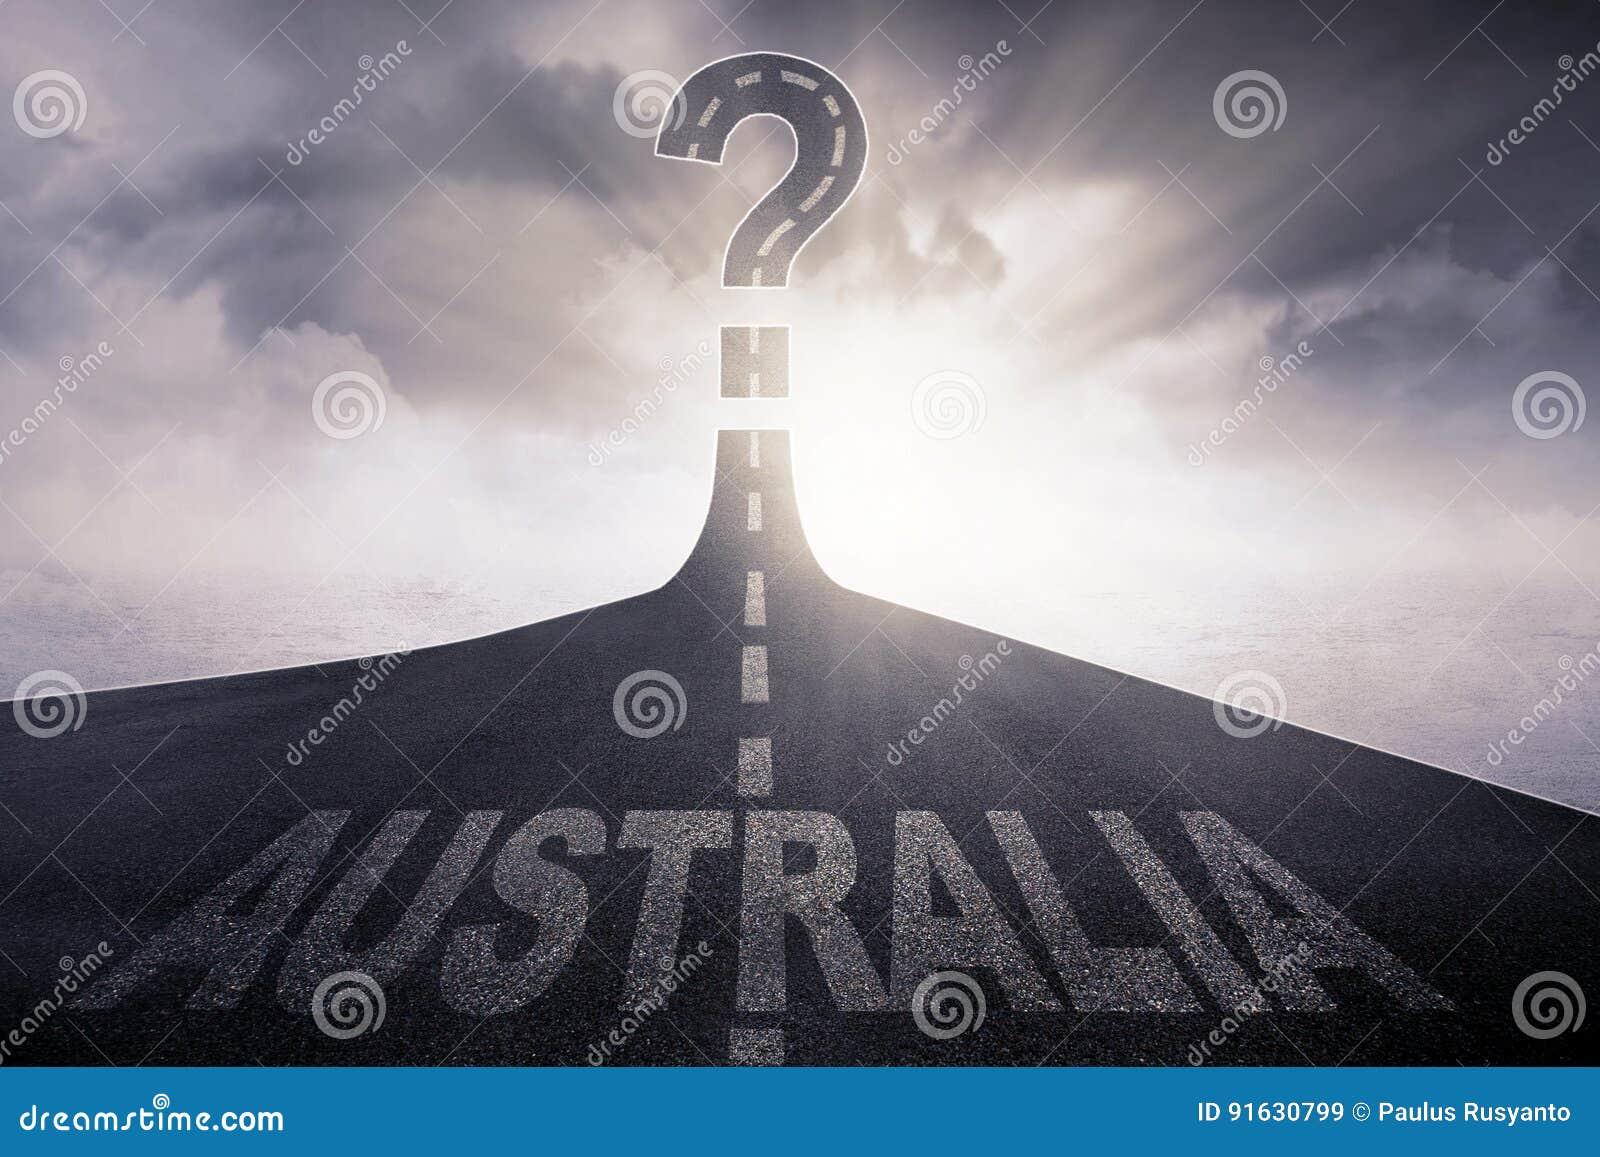 Date questions in Australia